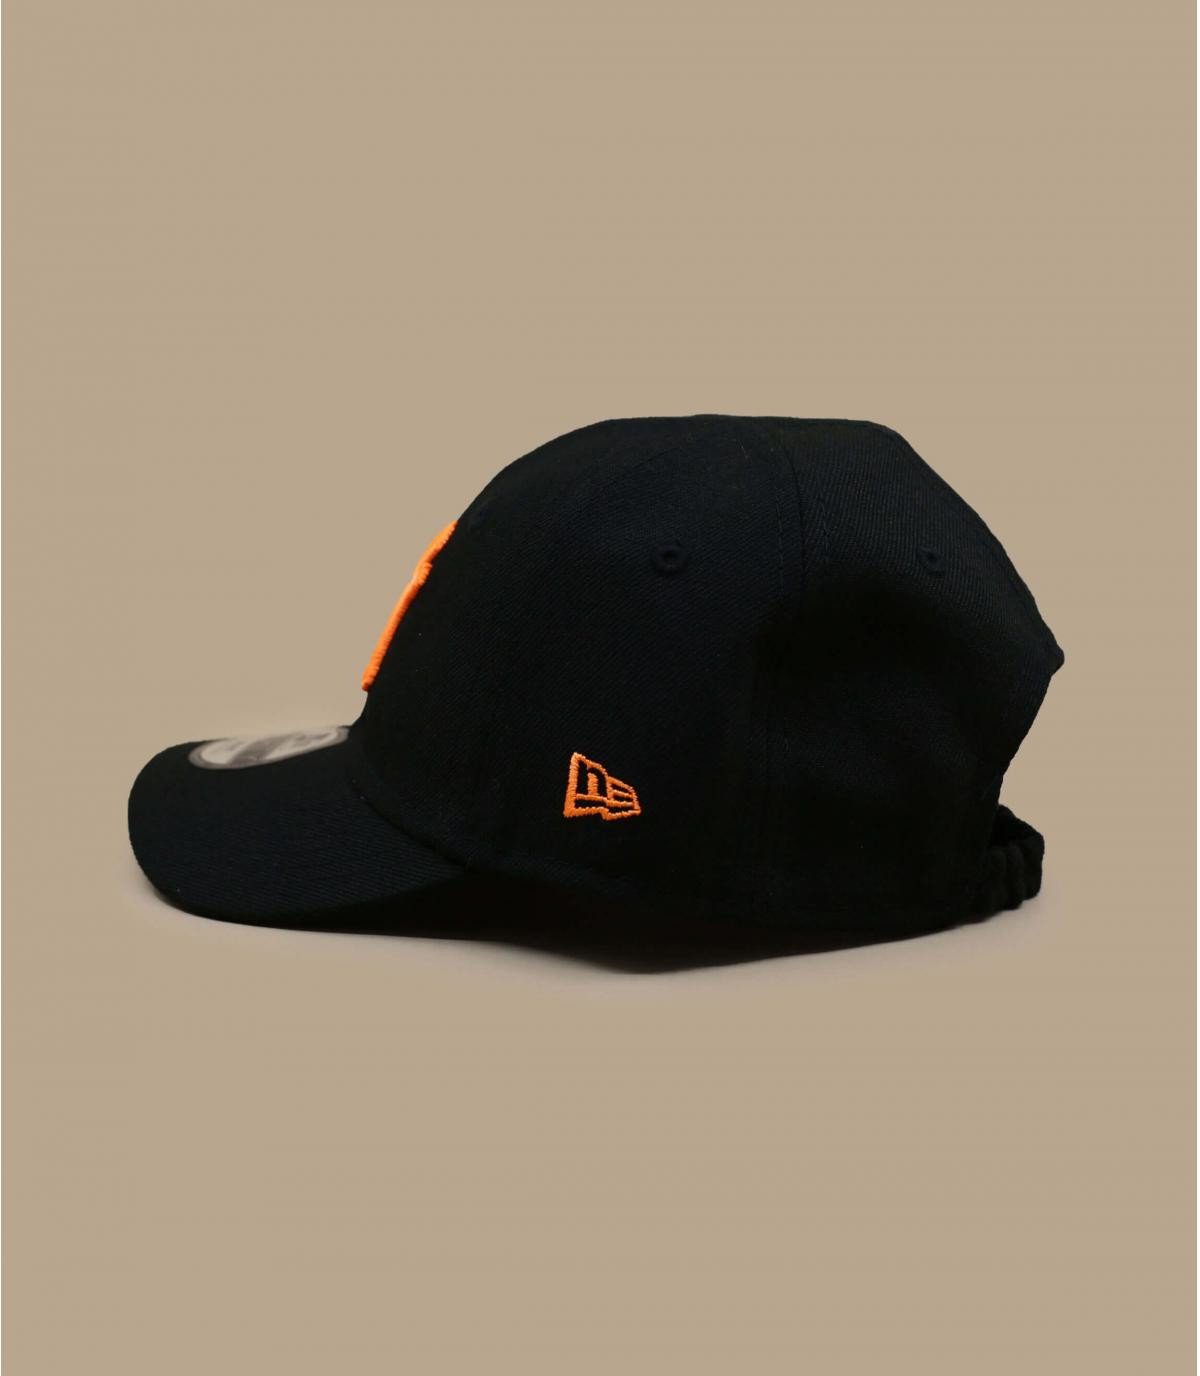 Details Baby Neon Pack NY 940 black orange - Abbildung 2